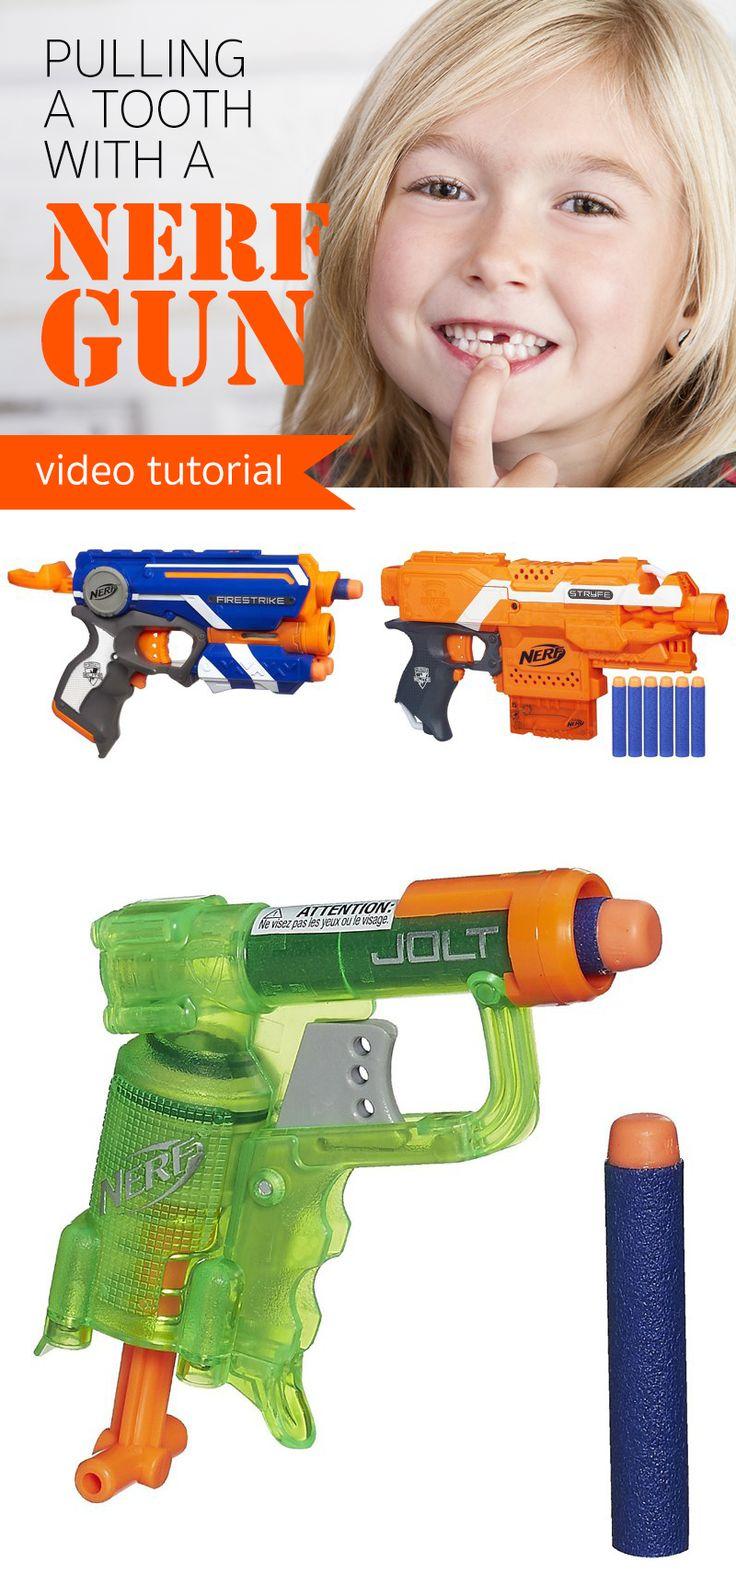 Nerf Gun Tooth Pull Kid Guns And Videos